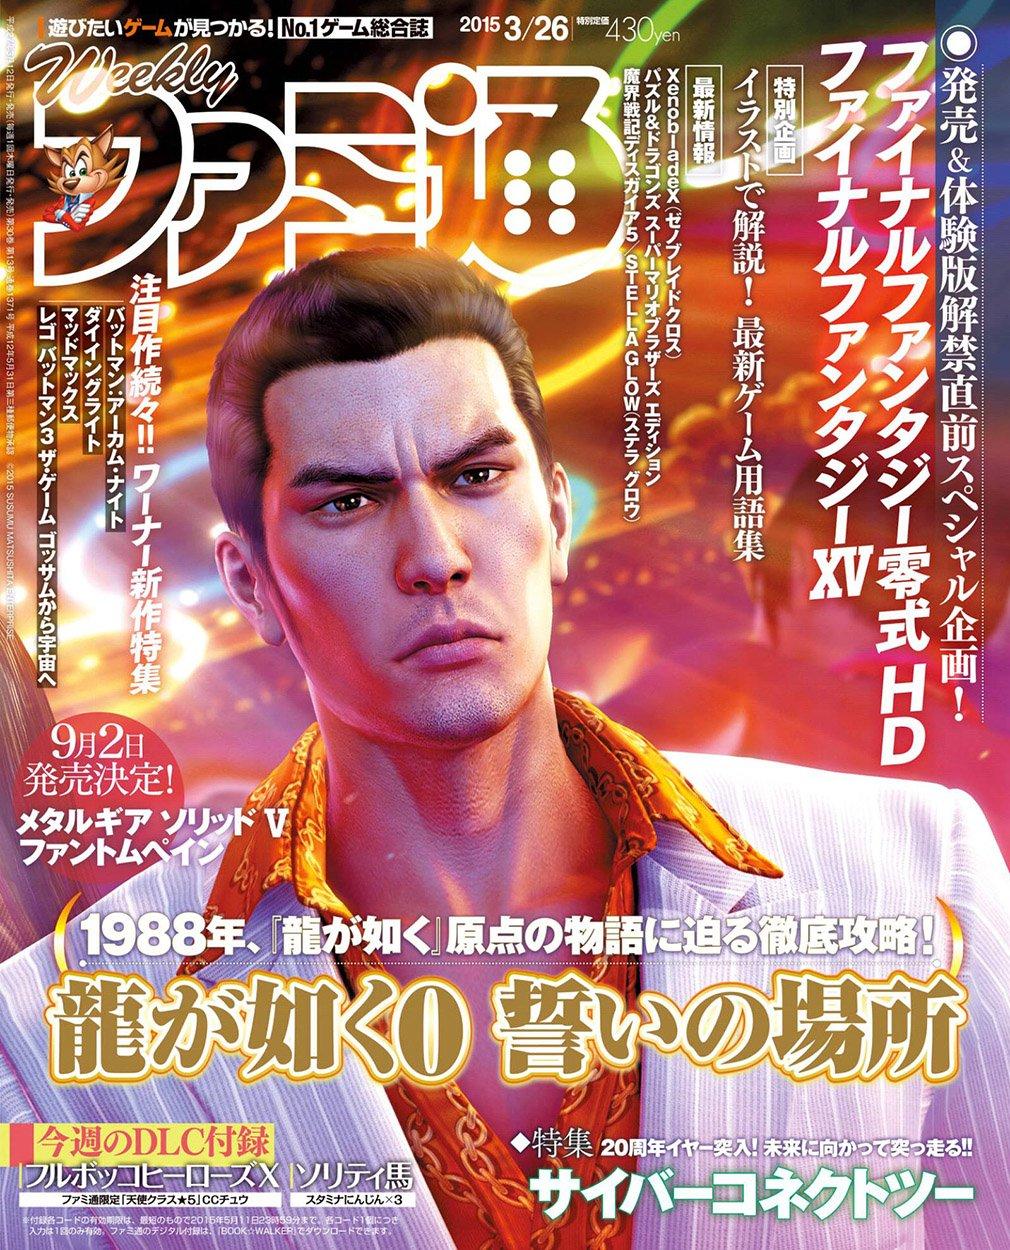 Famitsu 1371 March 26, 2015